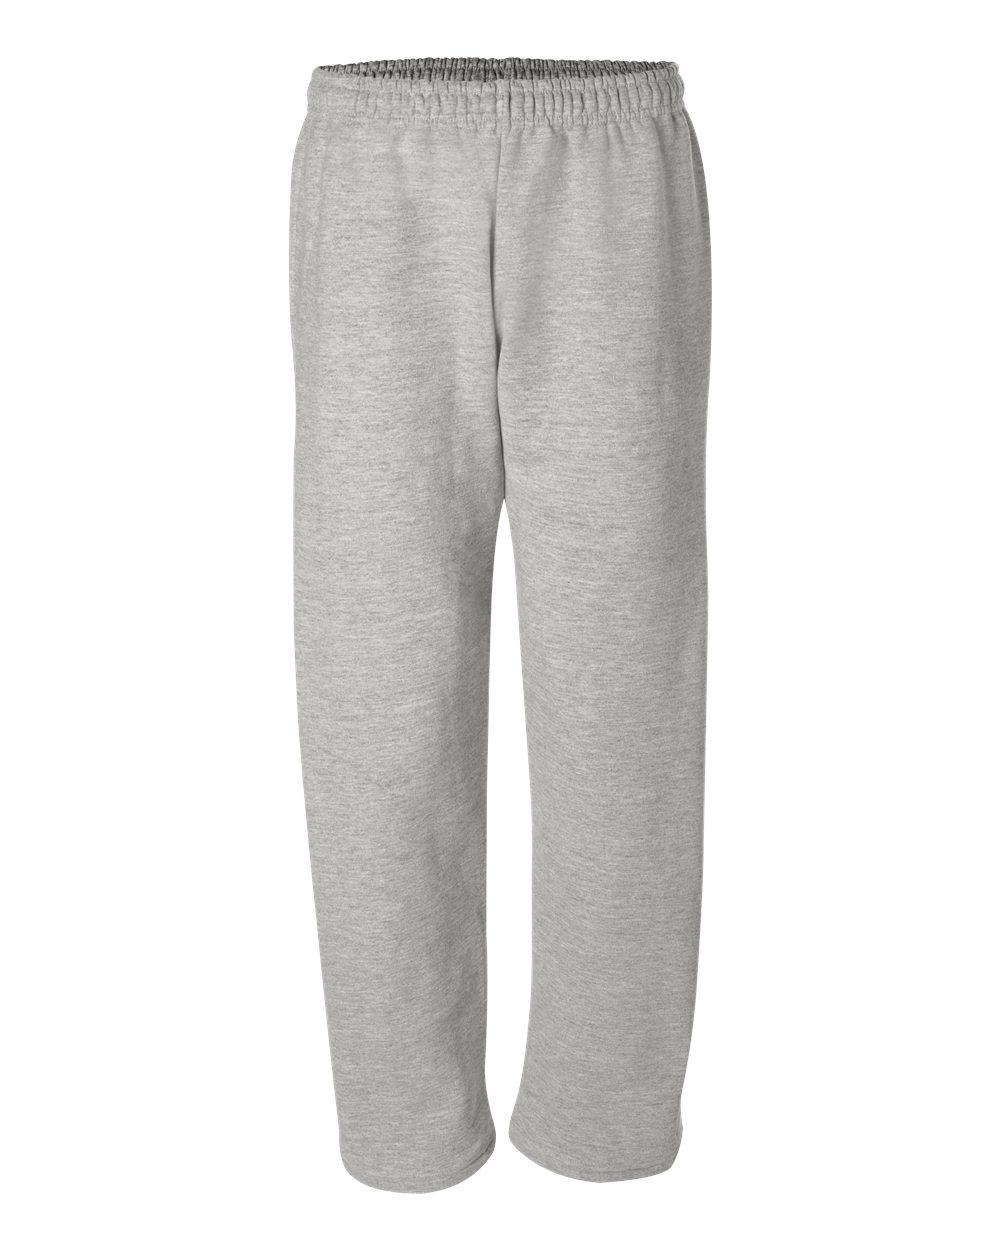 Gildan Open Bottom Sweatpants with Pockets.